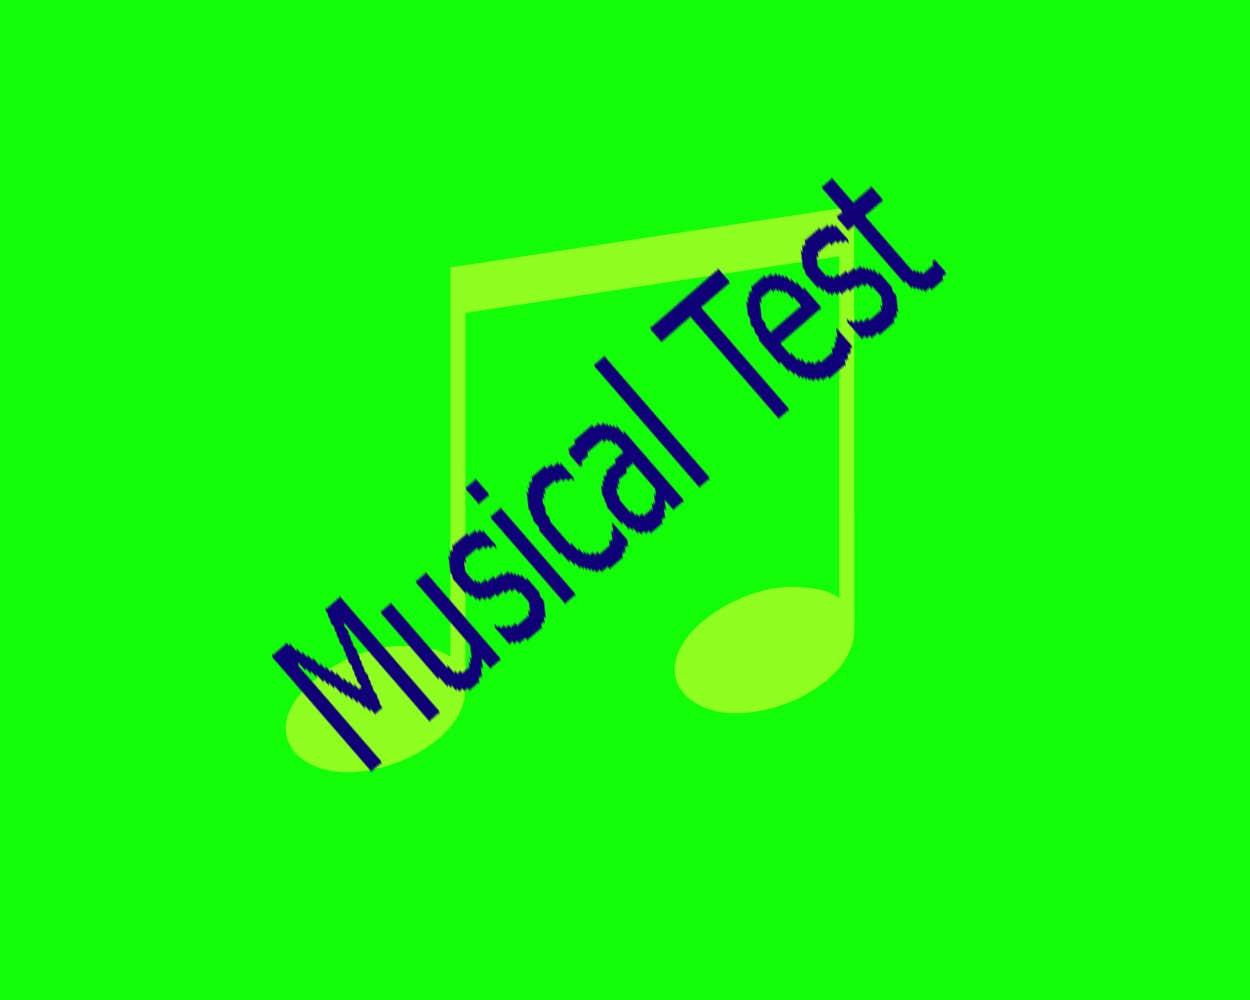 Play Musical test